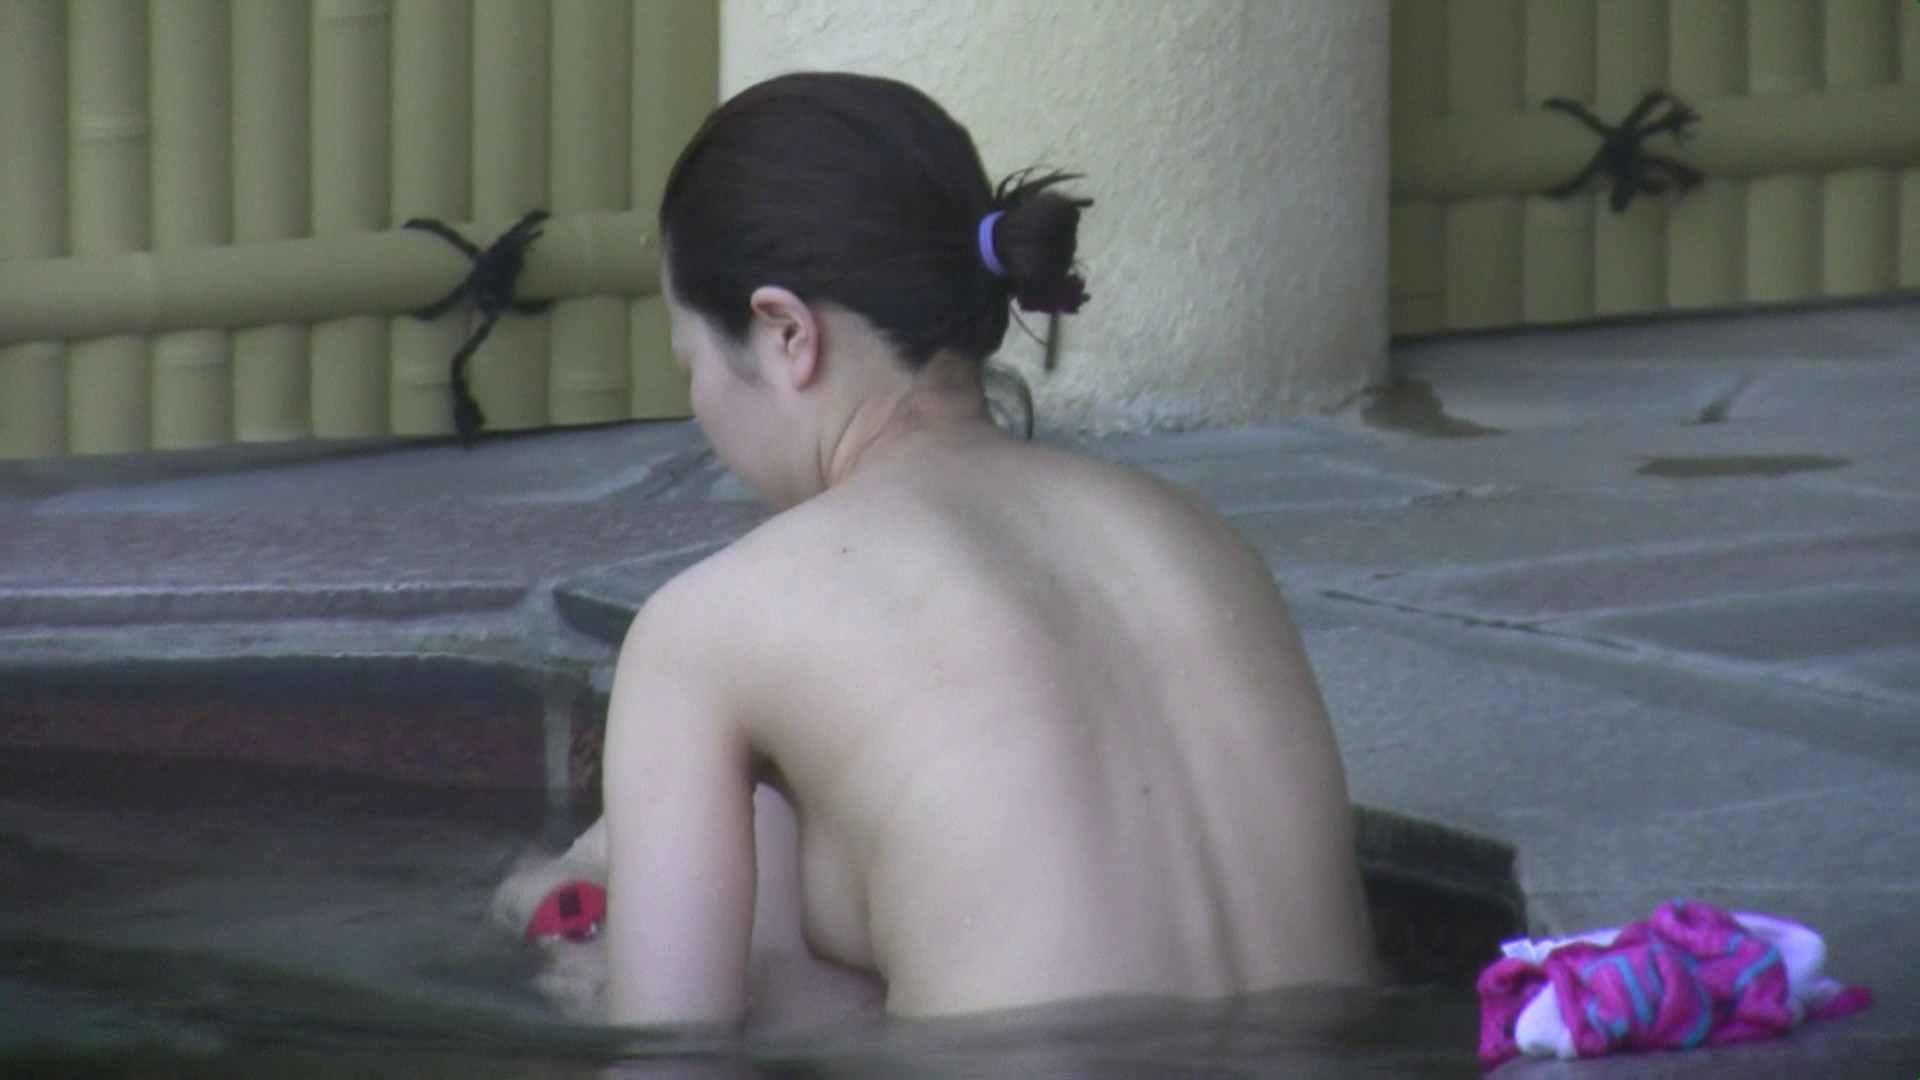 Aquaな露天風呂Vol.88【VIP限定】 盗撮 オマンコ無修正動画無料 61連発 26